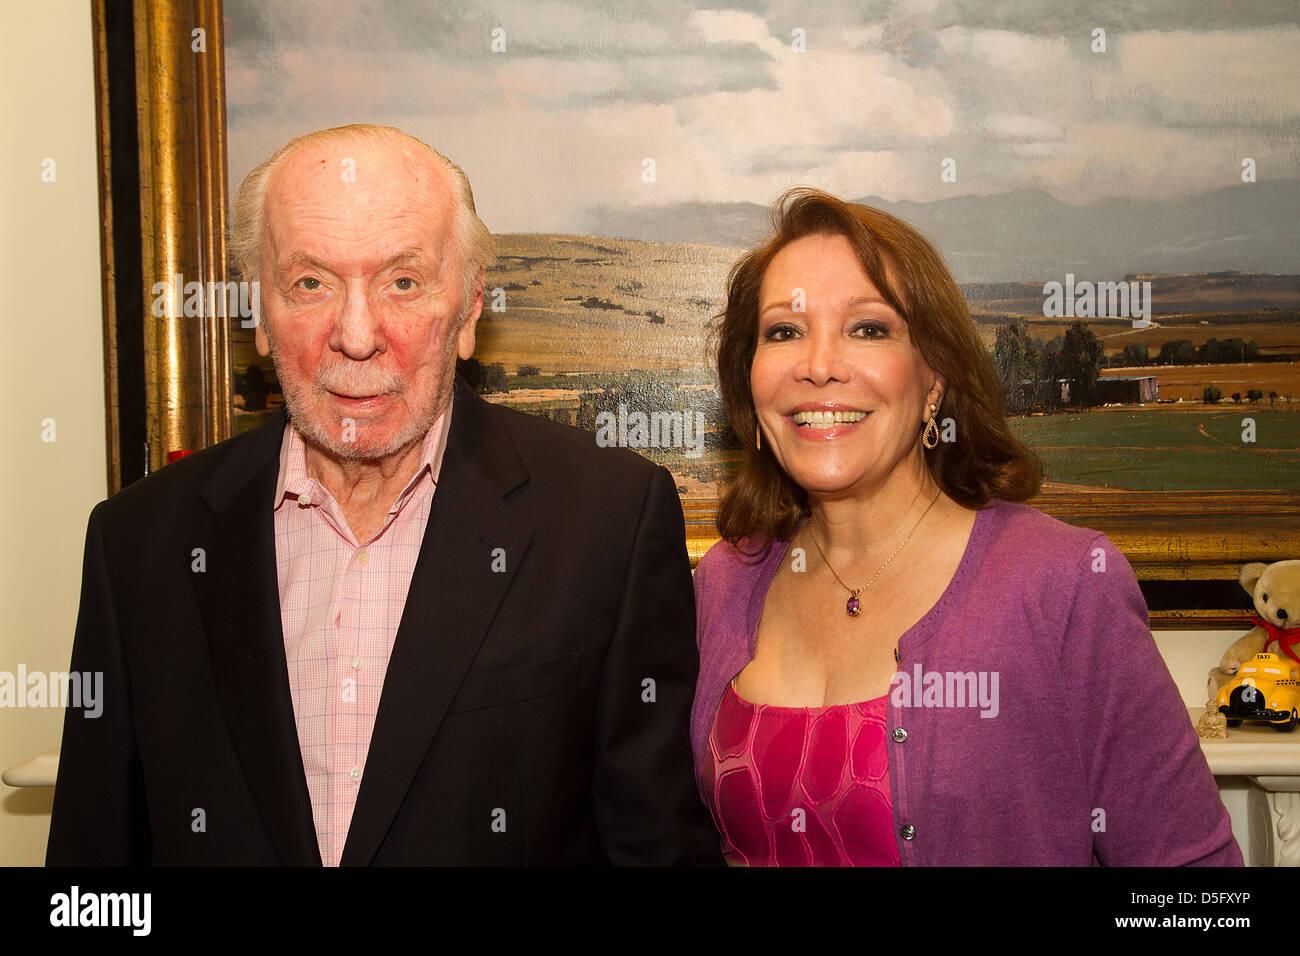 Les Miserables English lyricist Herbert Kretzmer OBE and wife Sybil Sever at home in London - Stock Image